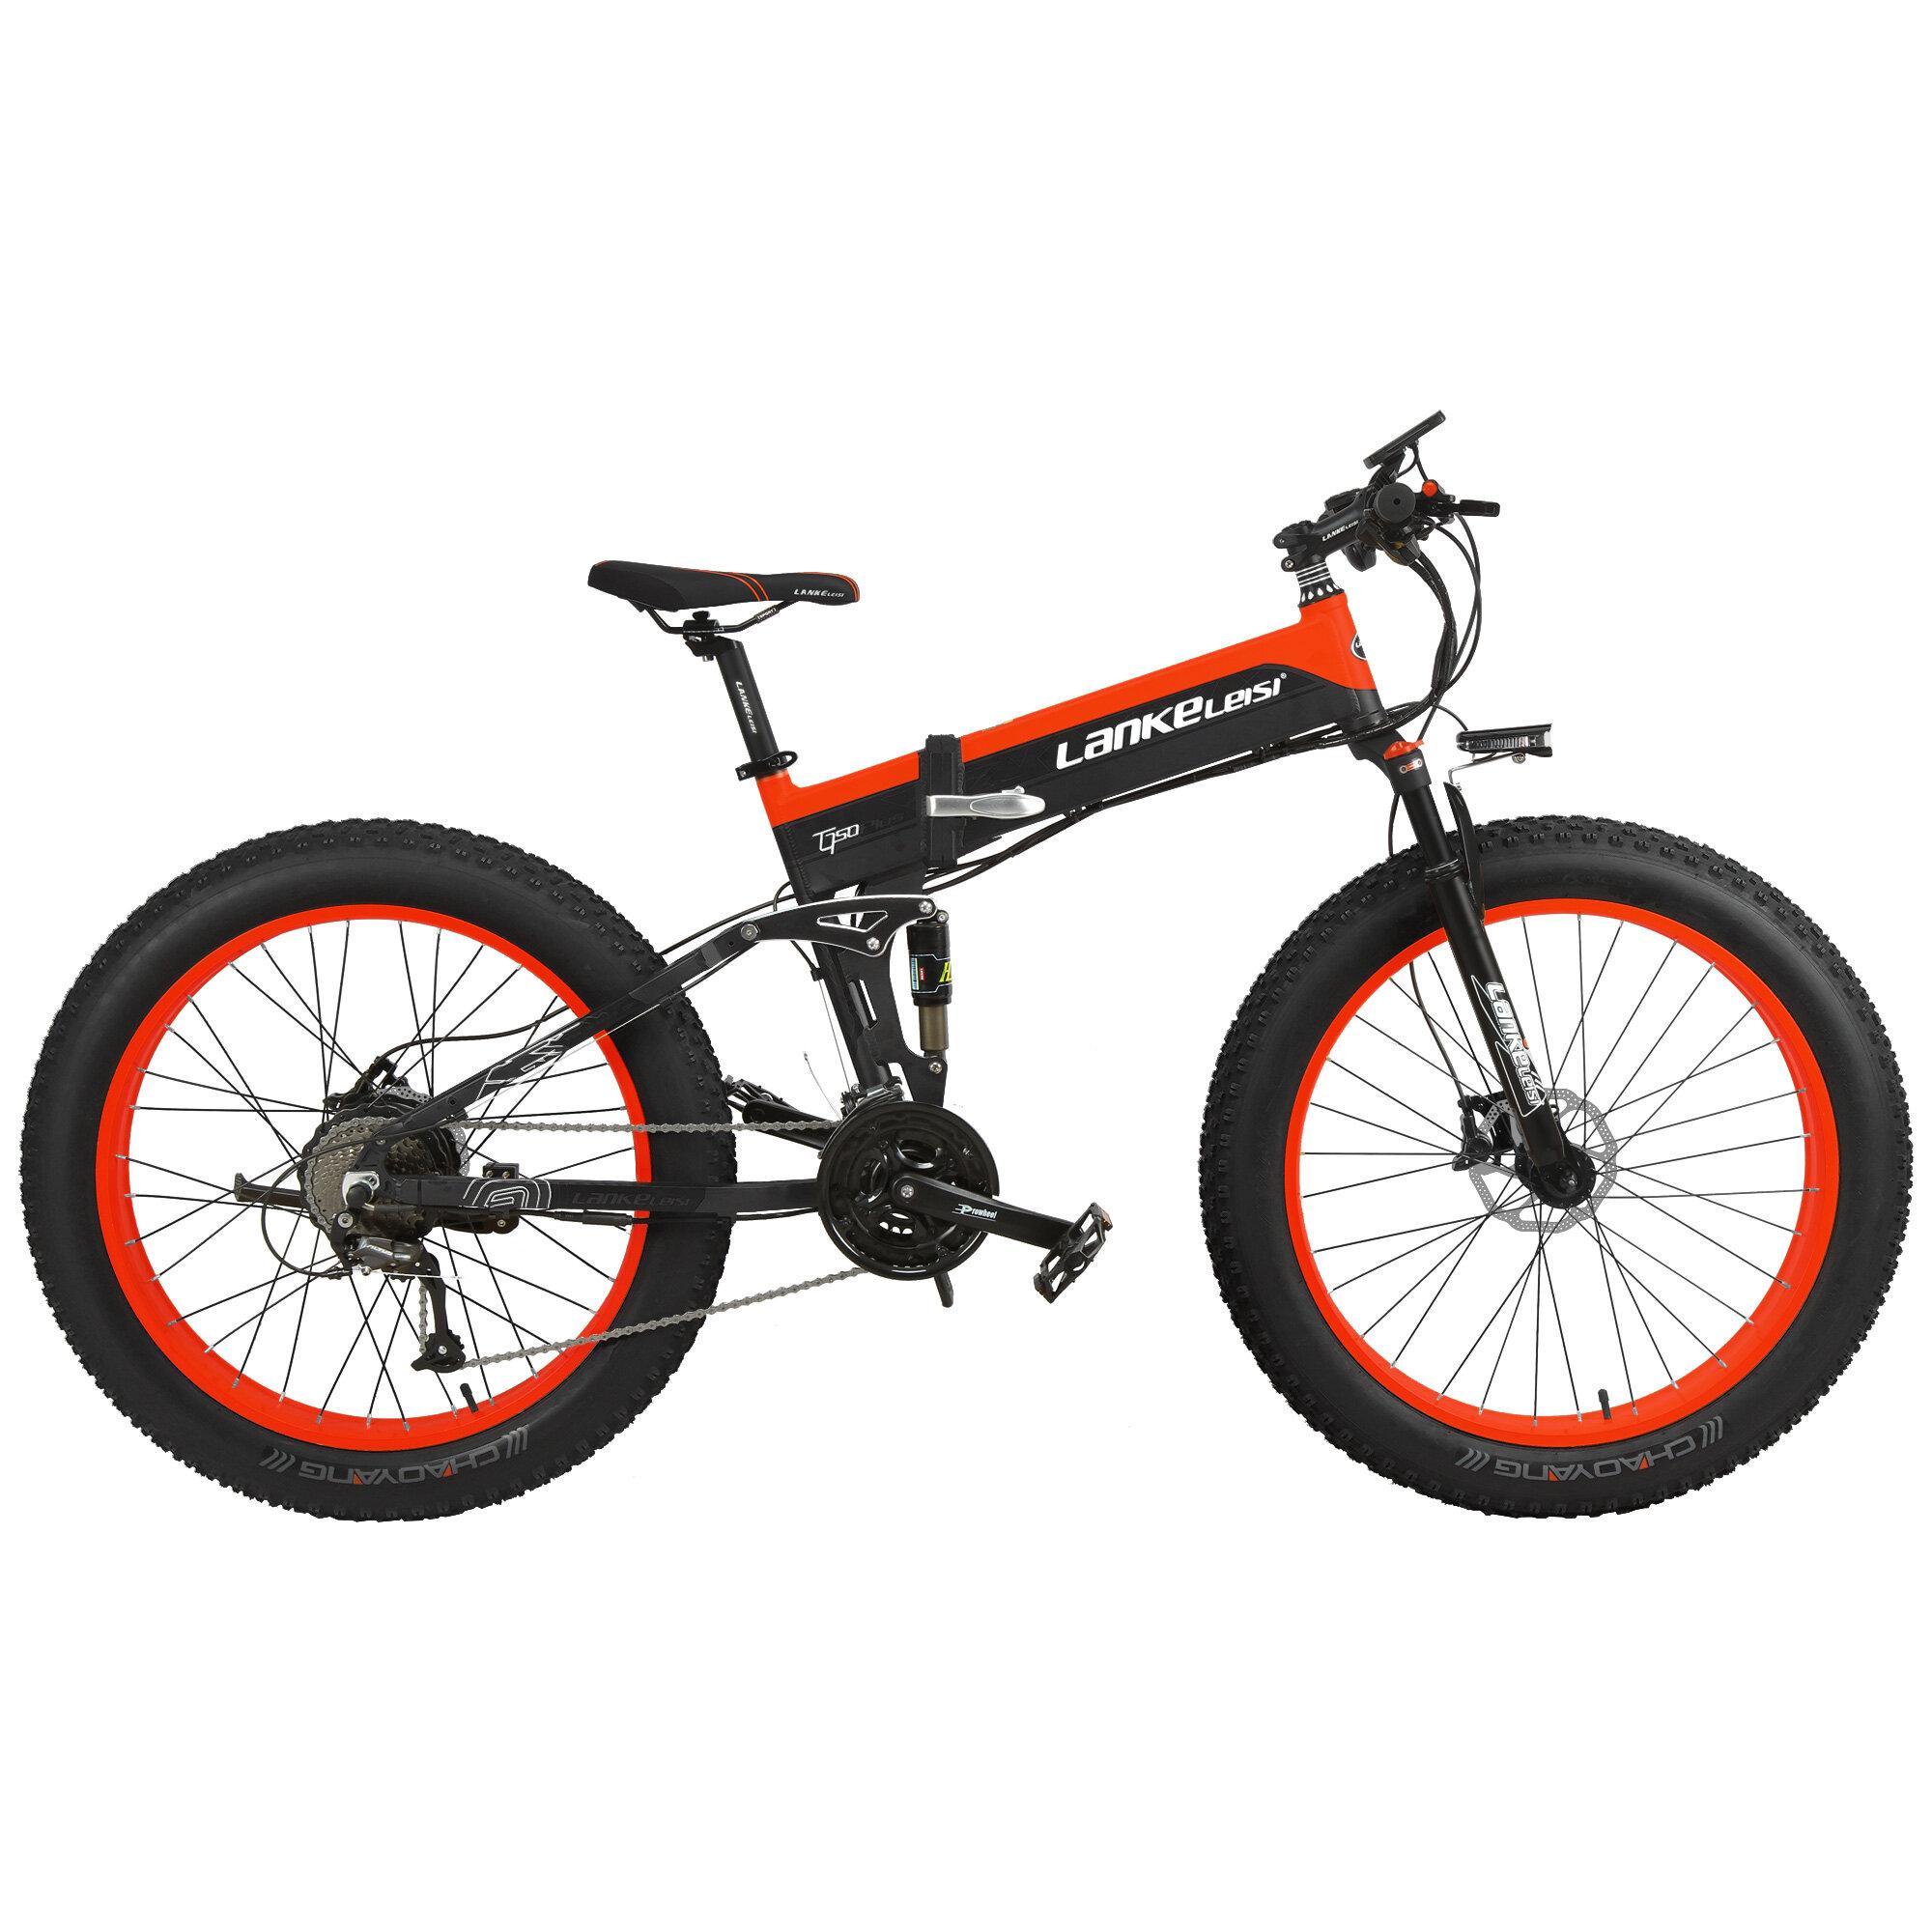 LANKELEISI XT750PLUS 12.8Ah 48V 1000W 26Inch Moped Electric Bike Folding Bike 80Km Mileage Max Load 120kg With EU Plug